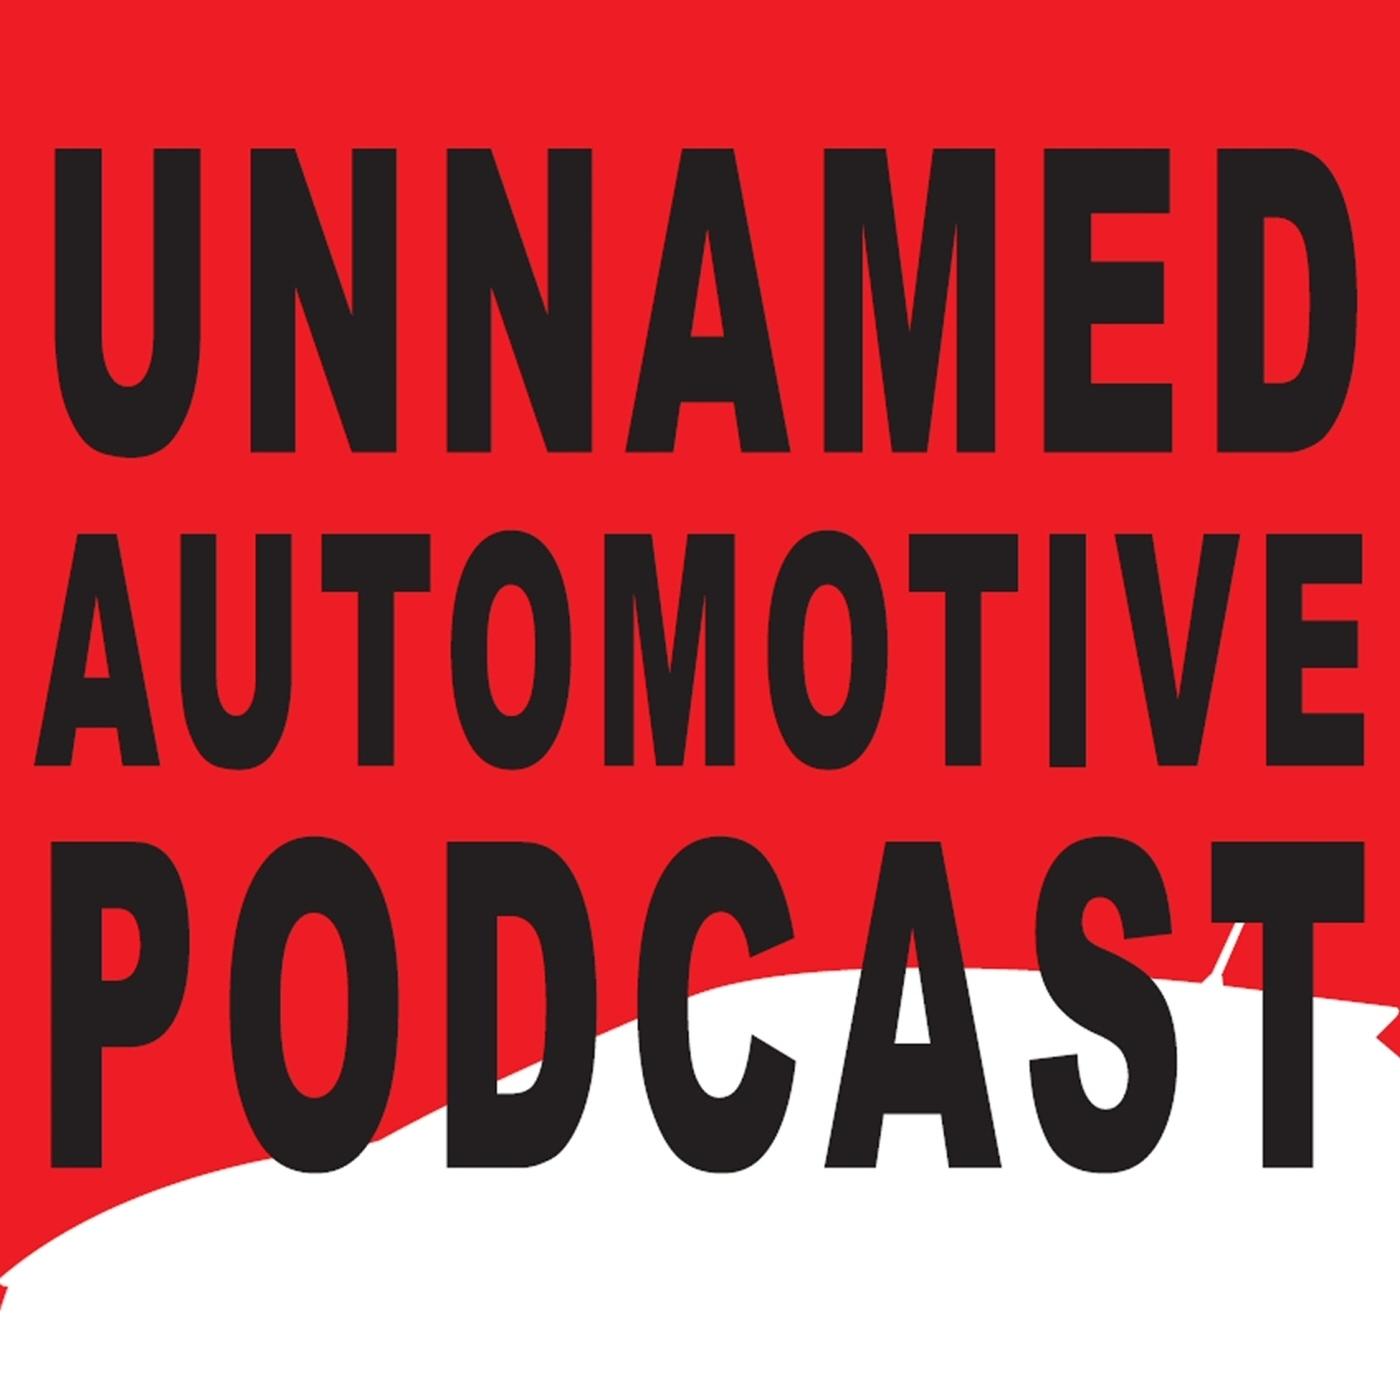 Unnamed Automotive Podcast Episode 82: 2019 Mercedes-AMG